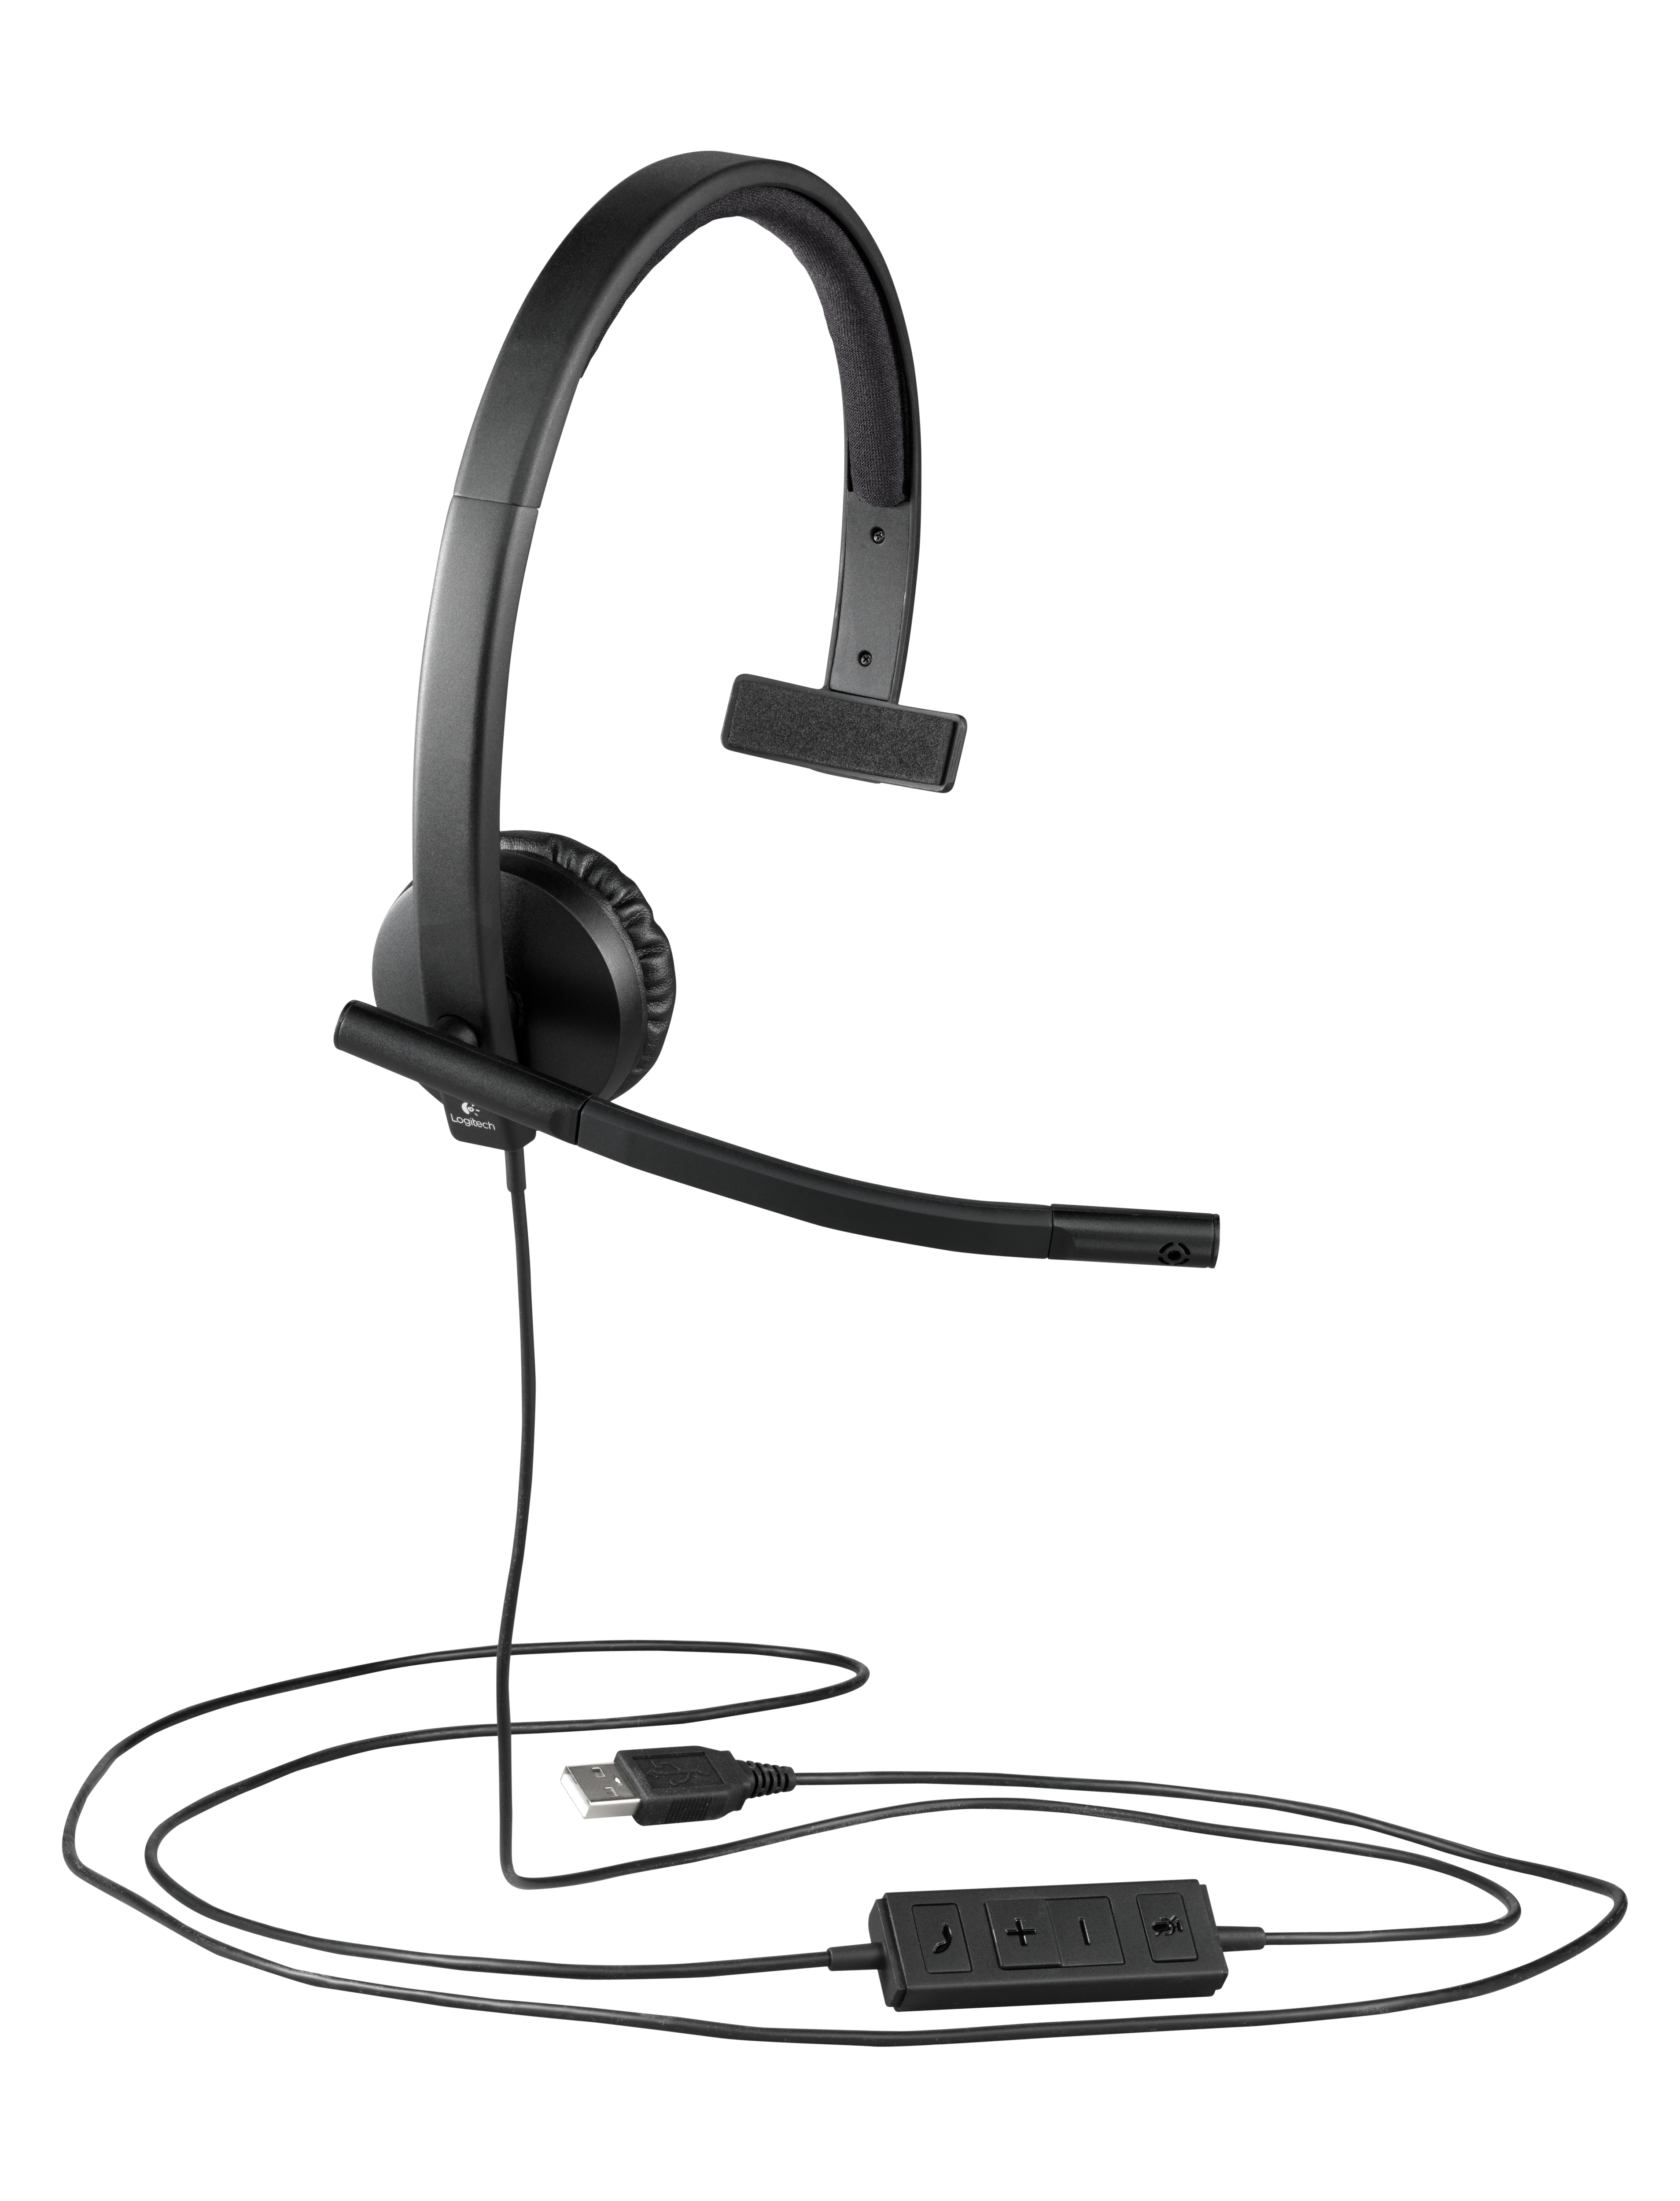 H570e USB Headset (on-ear)